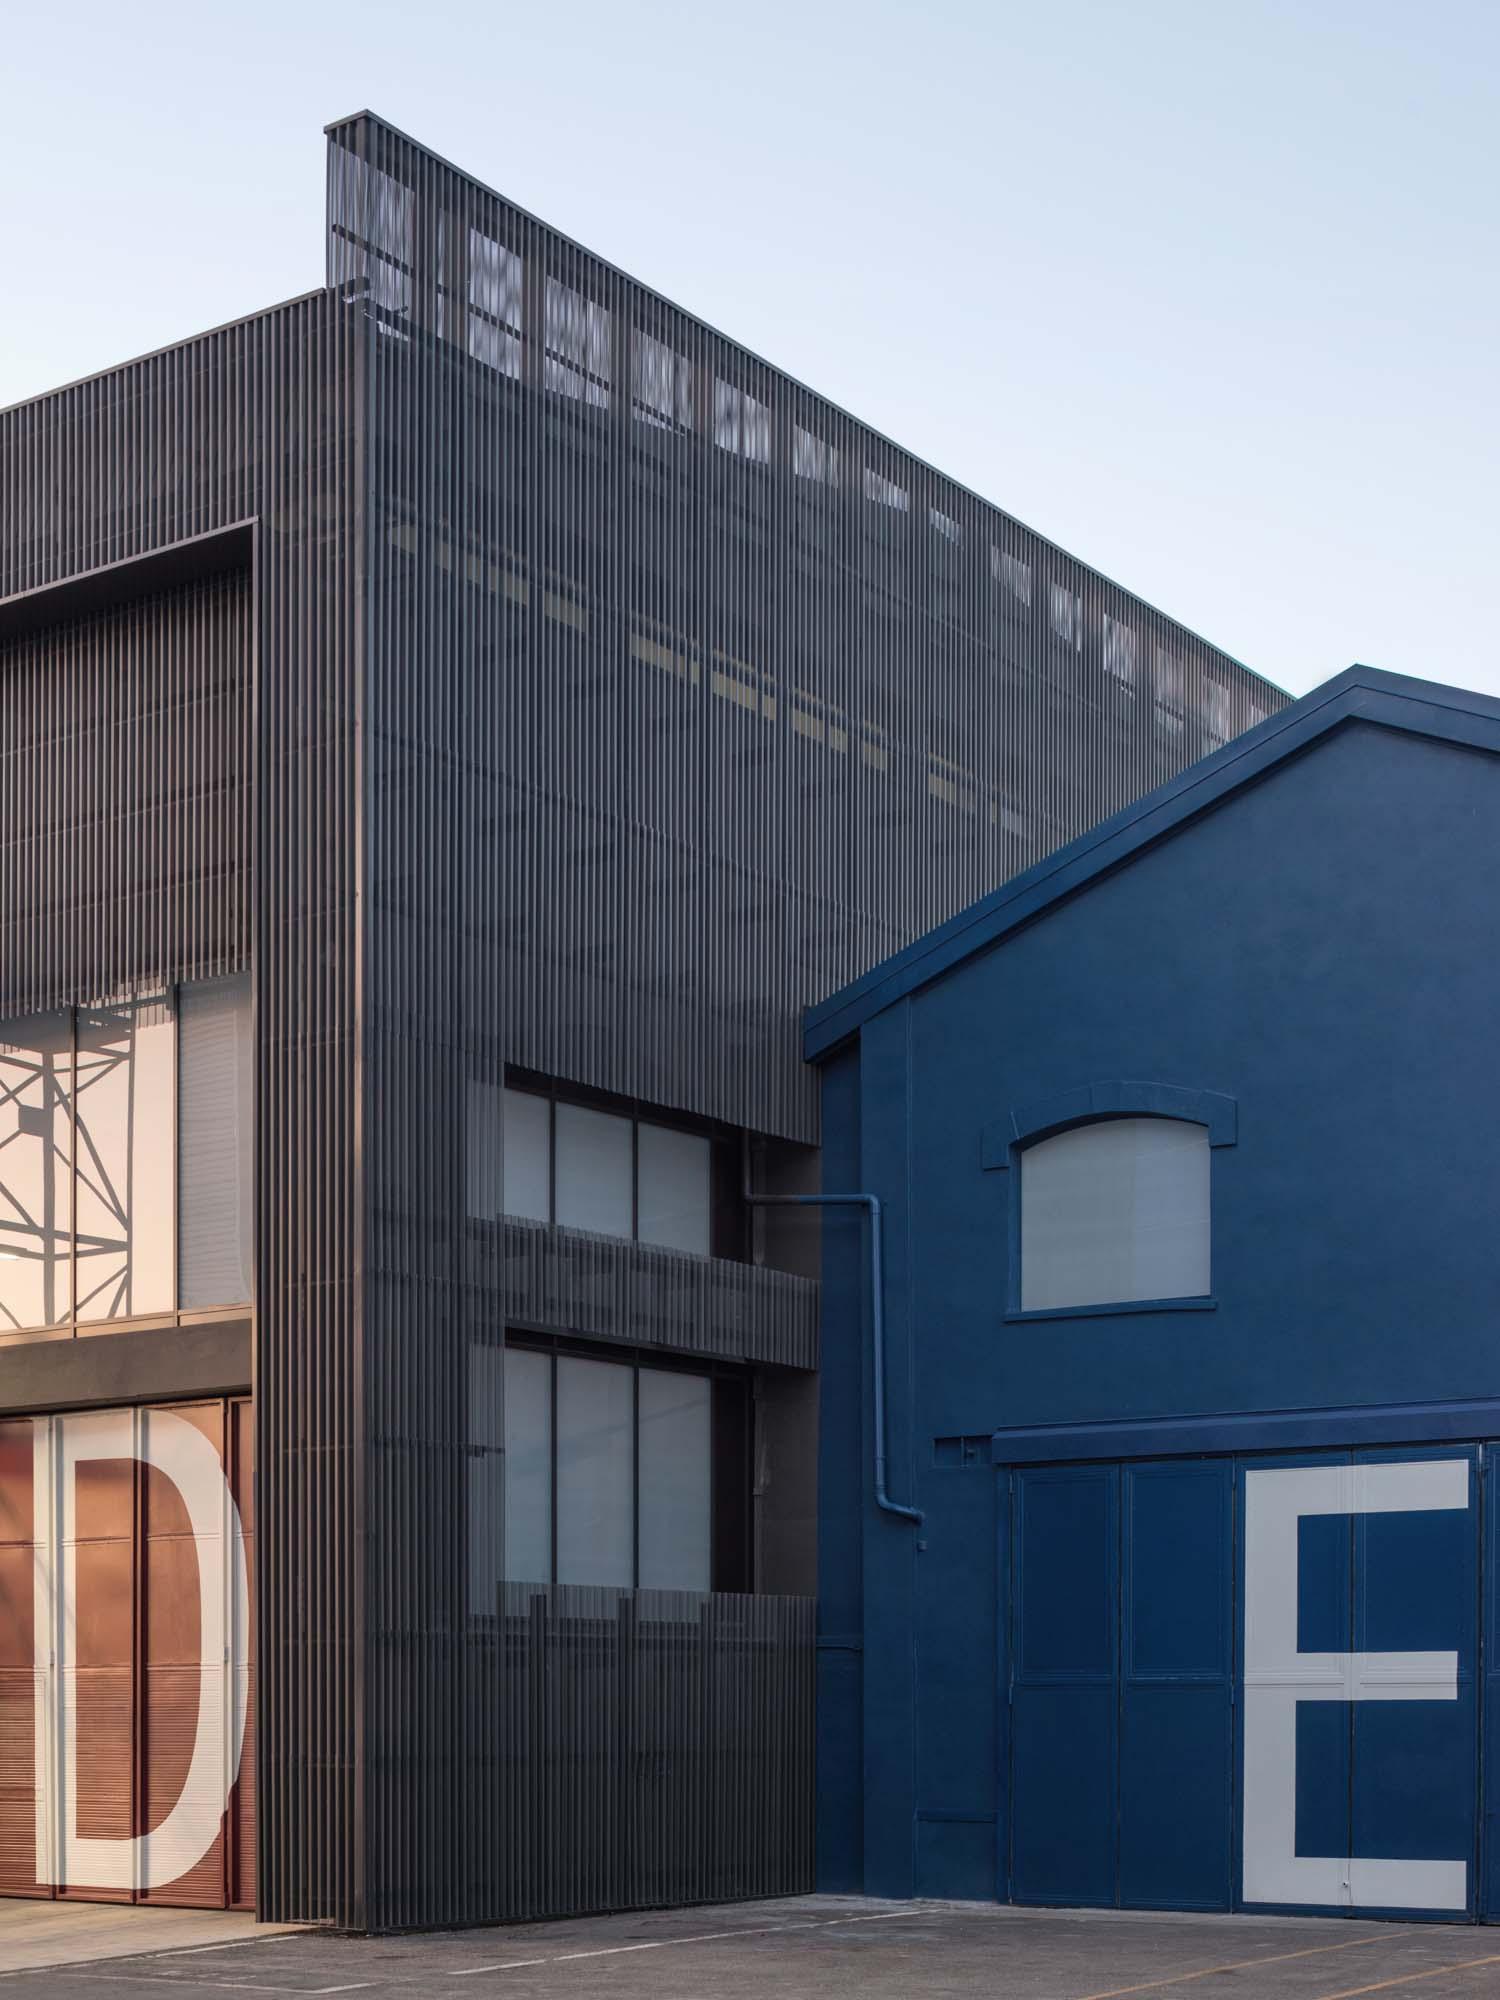 Sanlorenzo Headquarters - Lissoni Casal Ribeiro - photos by Simone Bossi